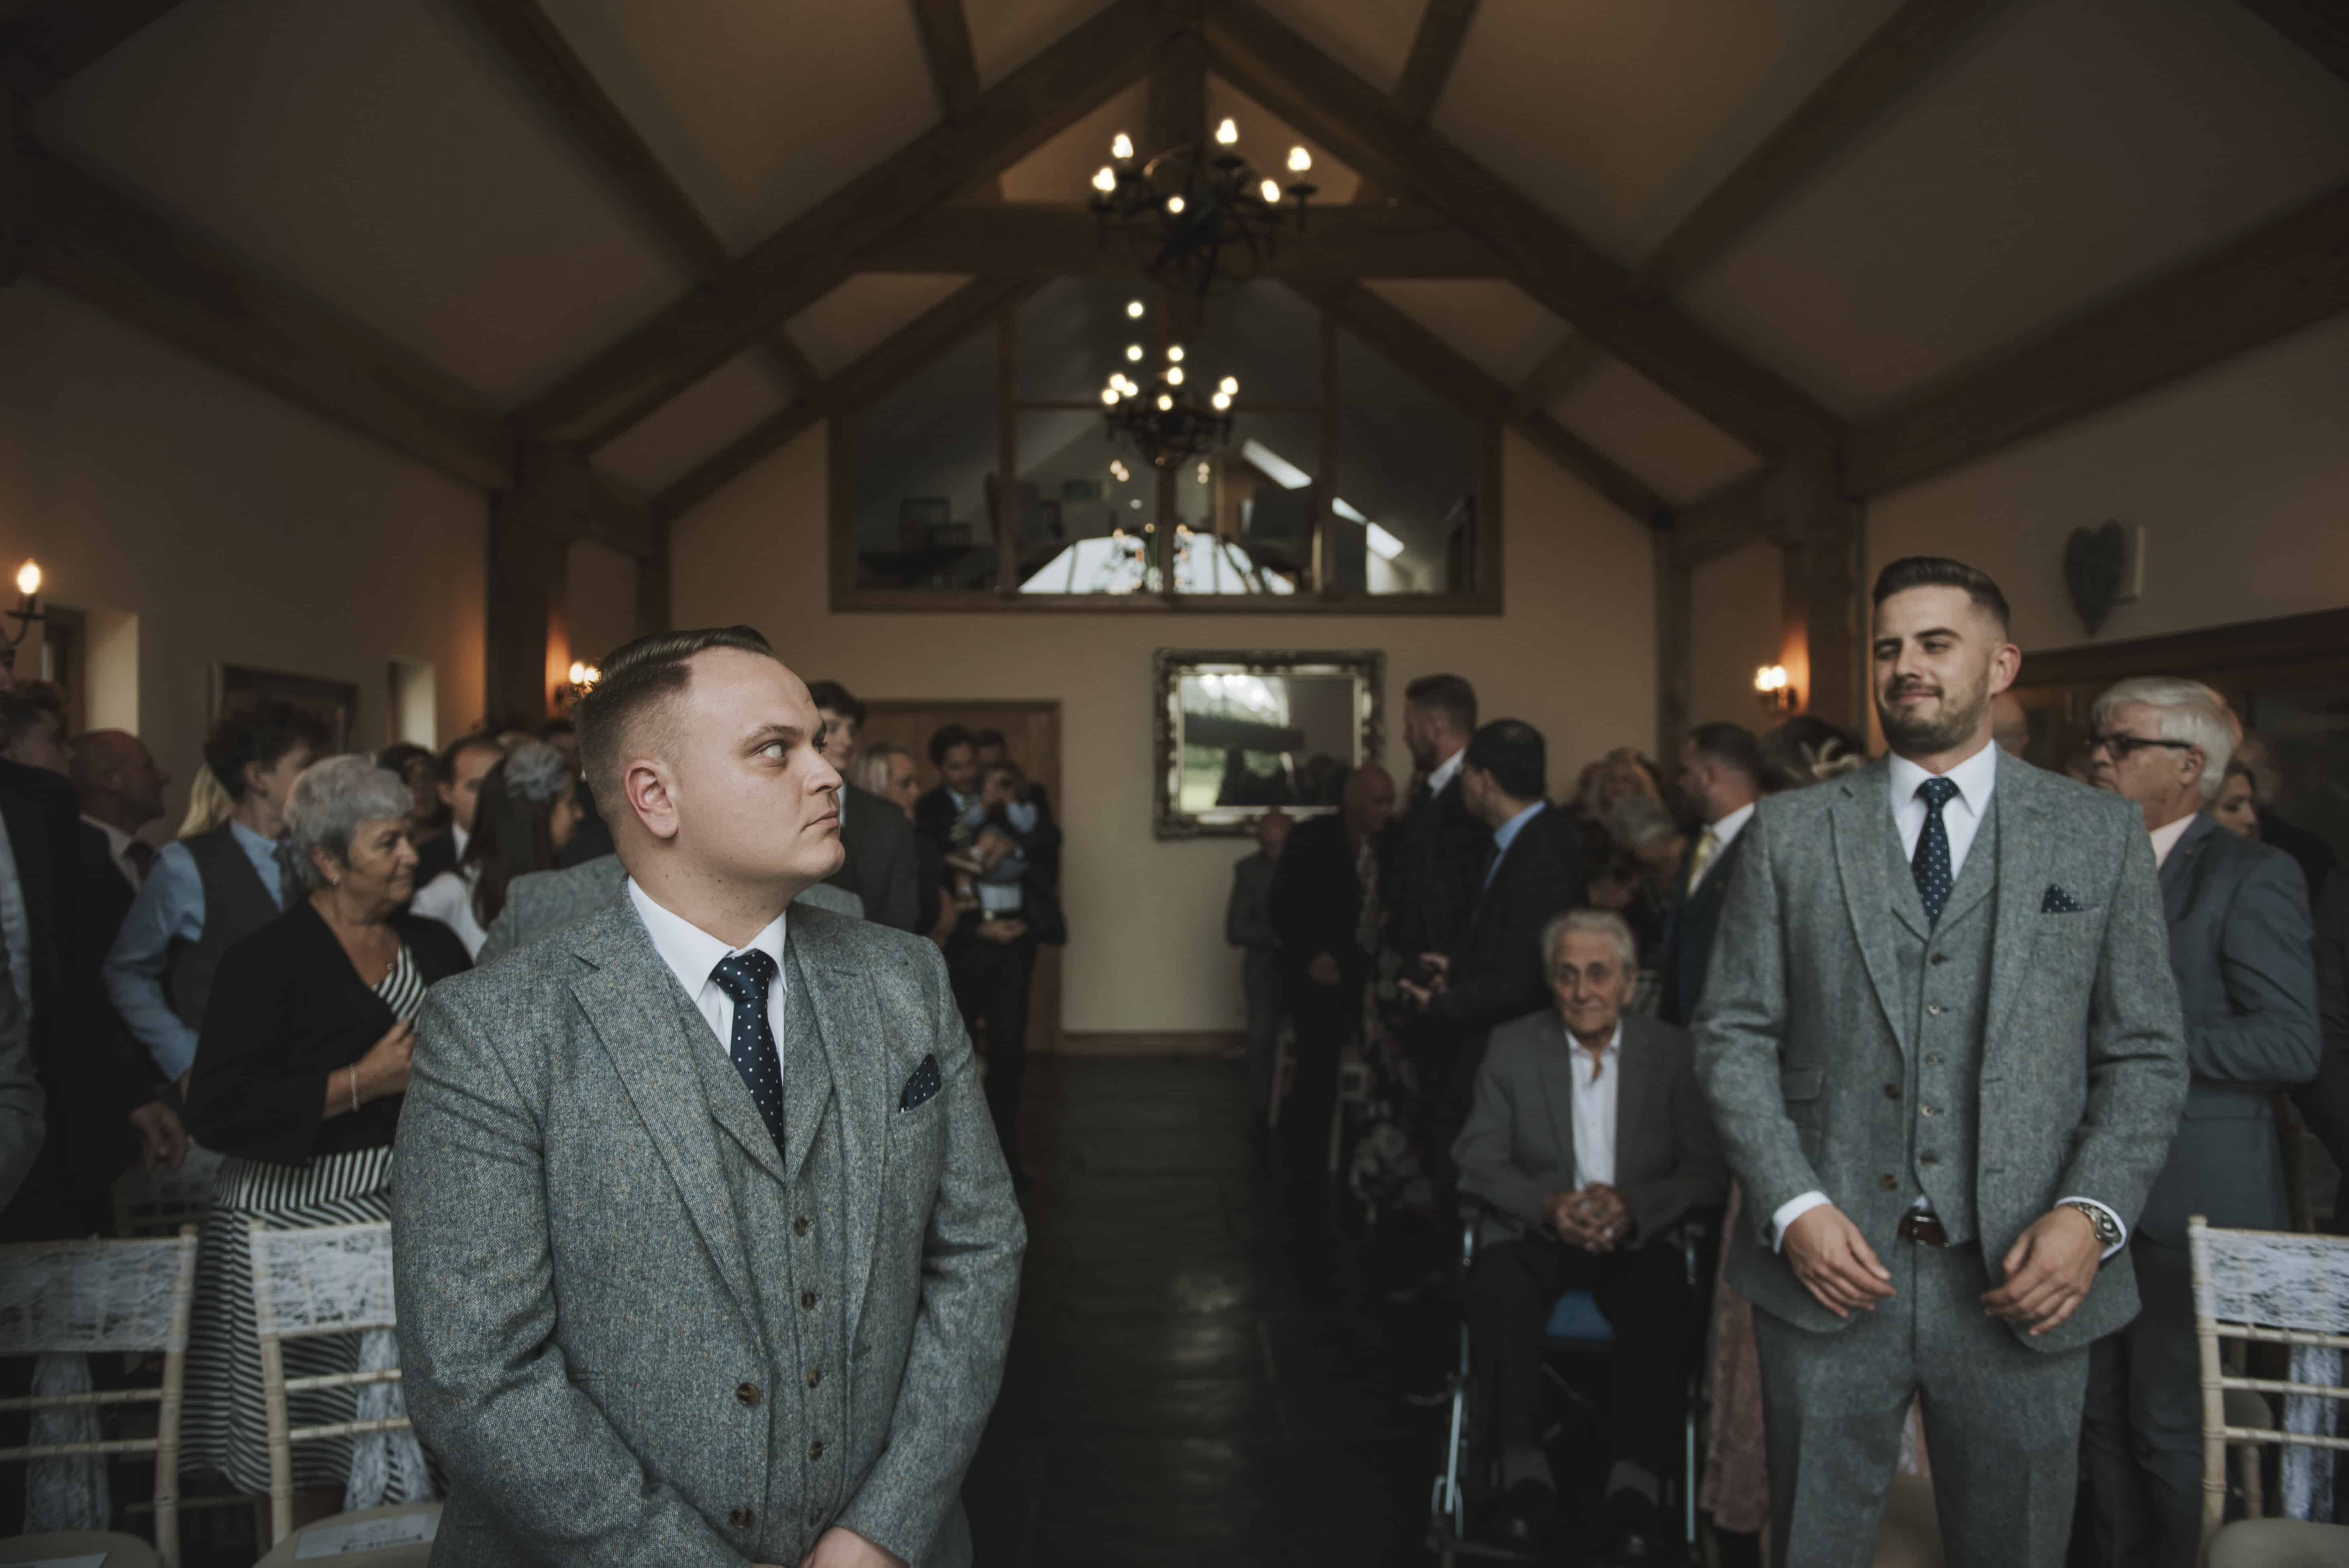 Groom & bestman waiting at altar Oldwalls Wedding Photographer